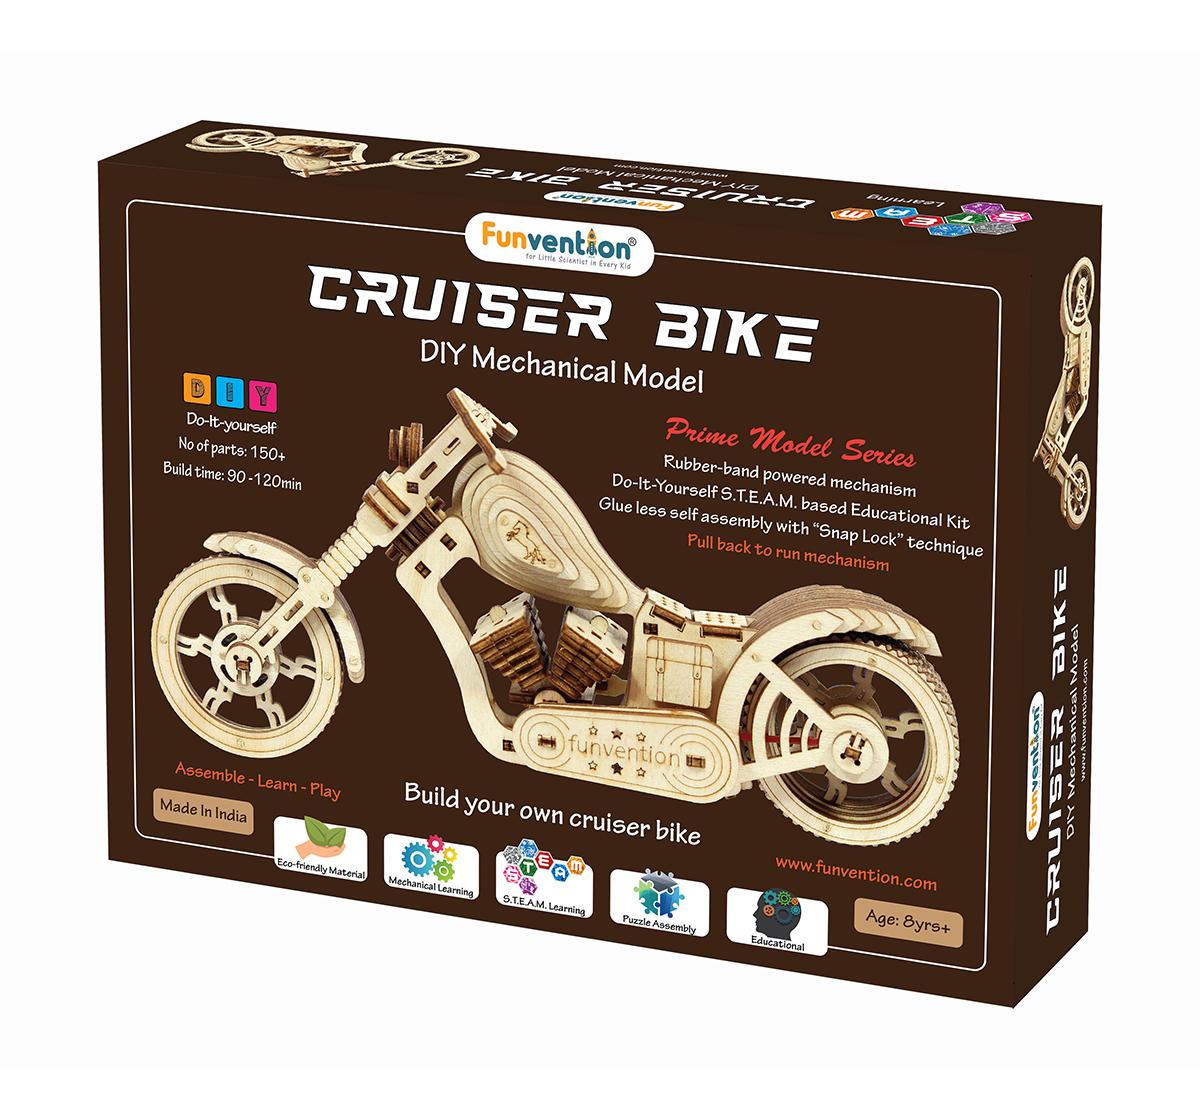 Funvention | Funvention Cruiser Bike - Diy Mechanical Model Stem for Kids Age 8Y+